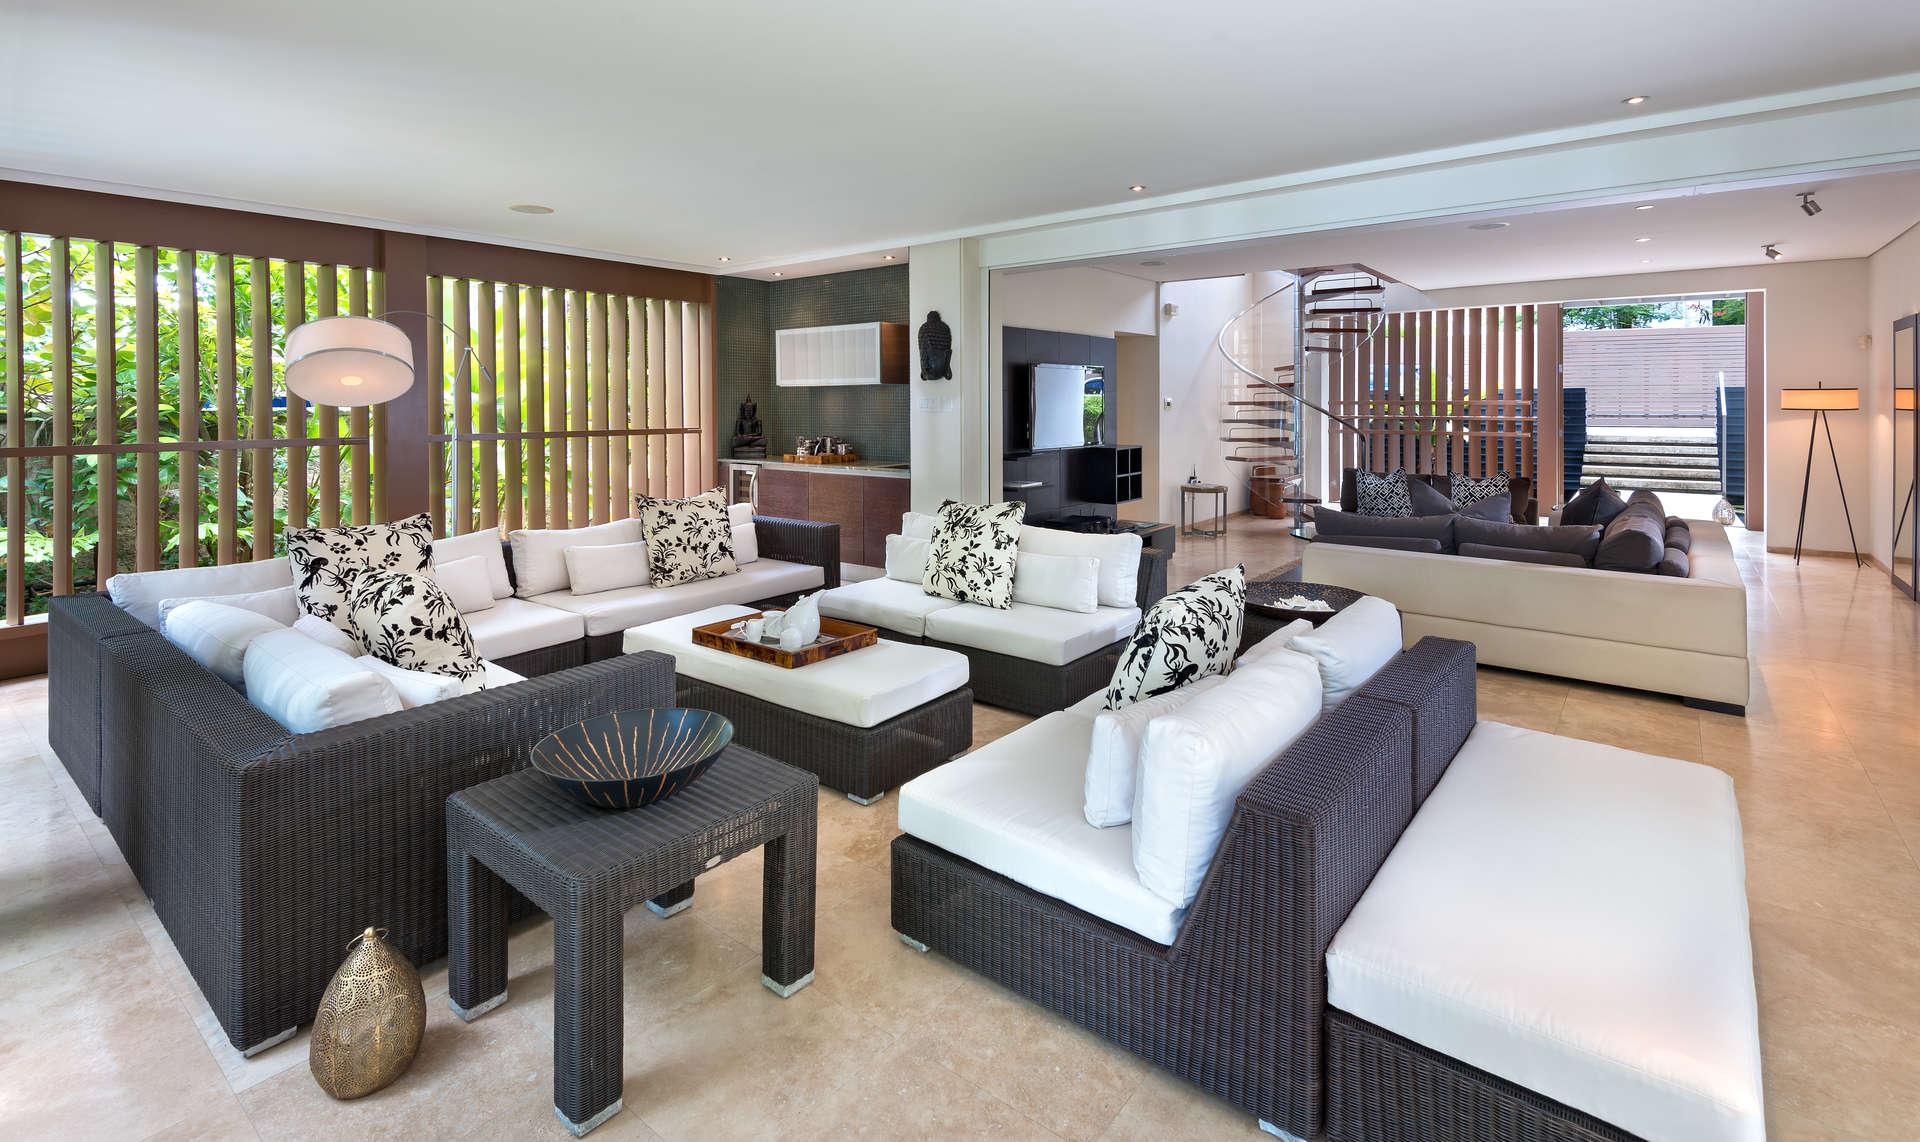 Luxury villa rentals caribbean - Barbados - St peter - Gibbes - Shoestring - Image 1/13